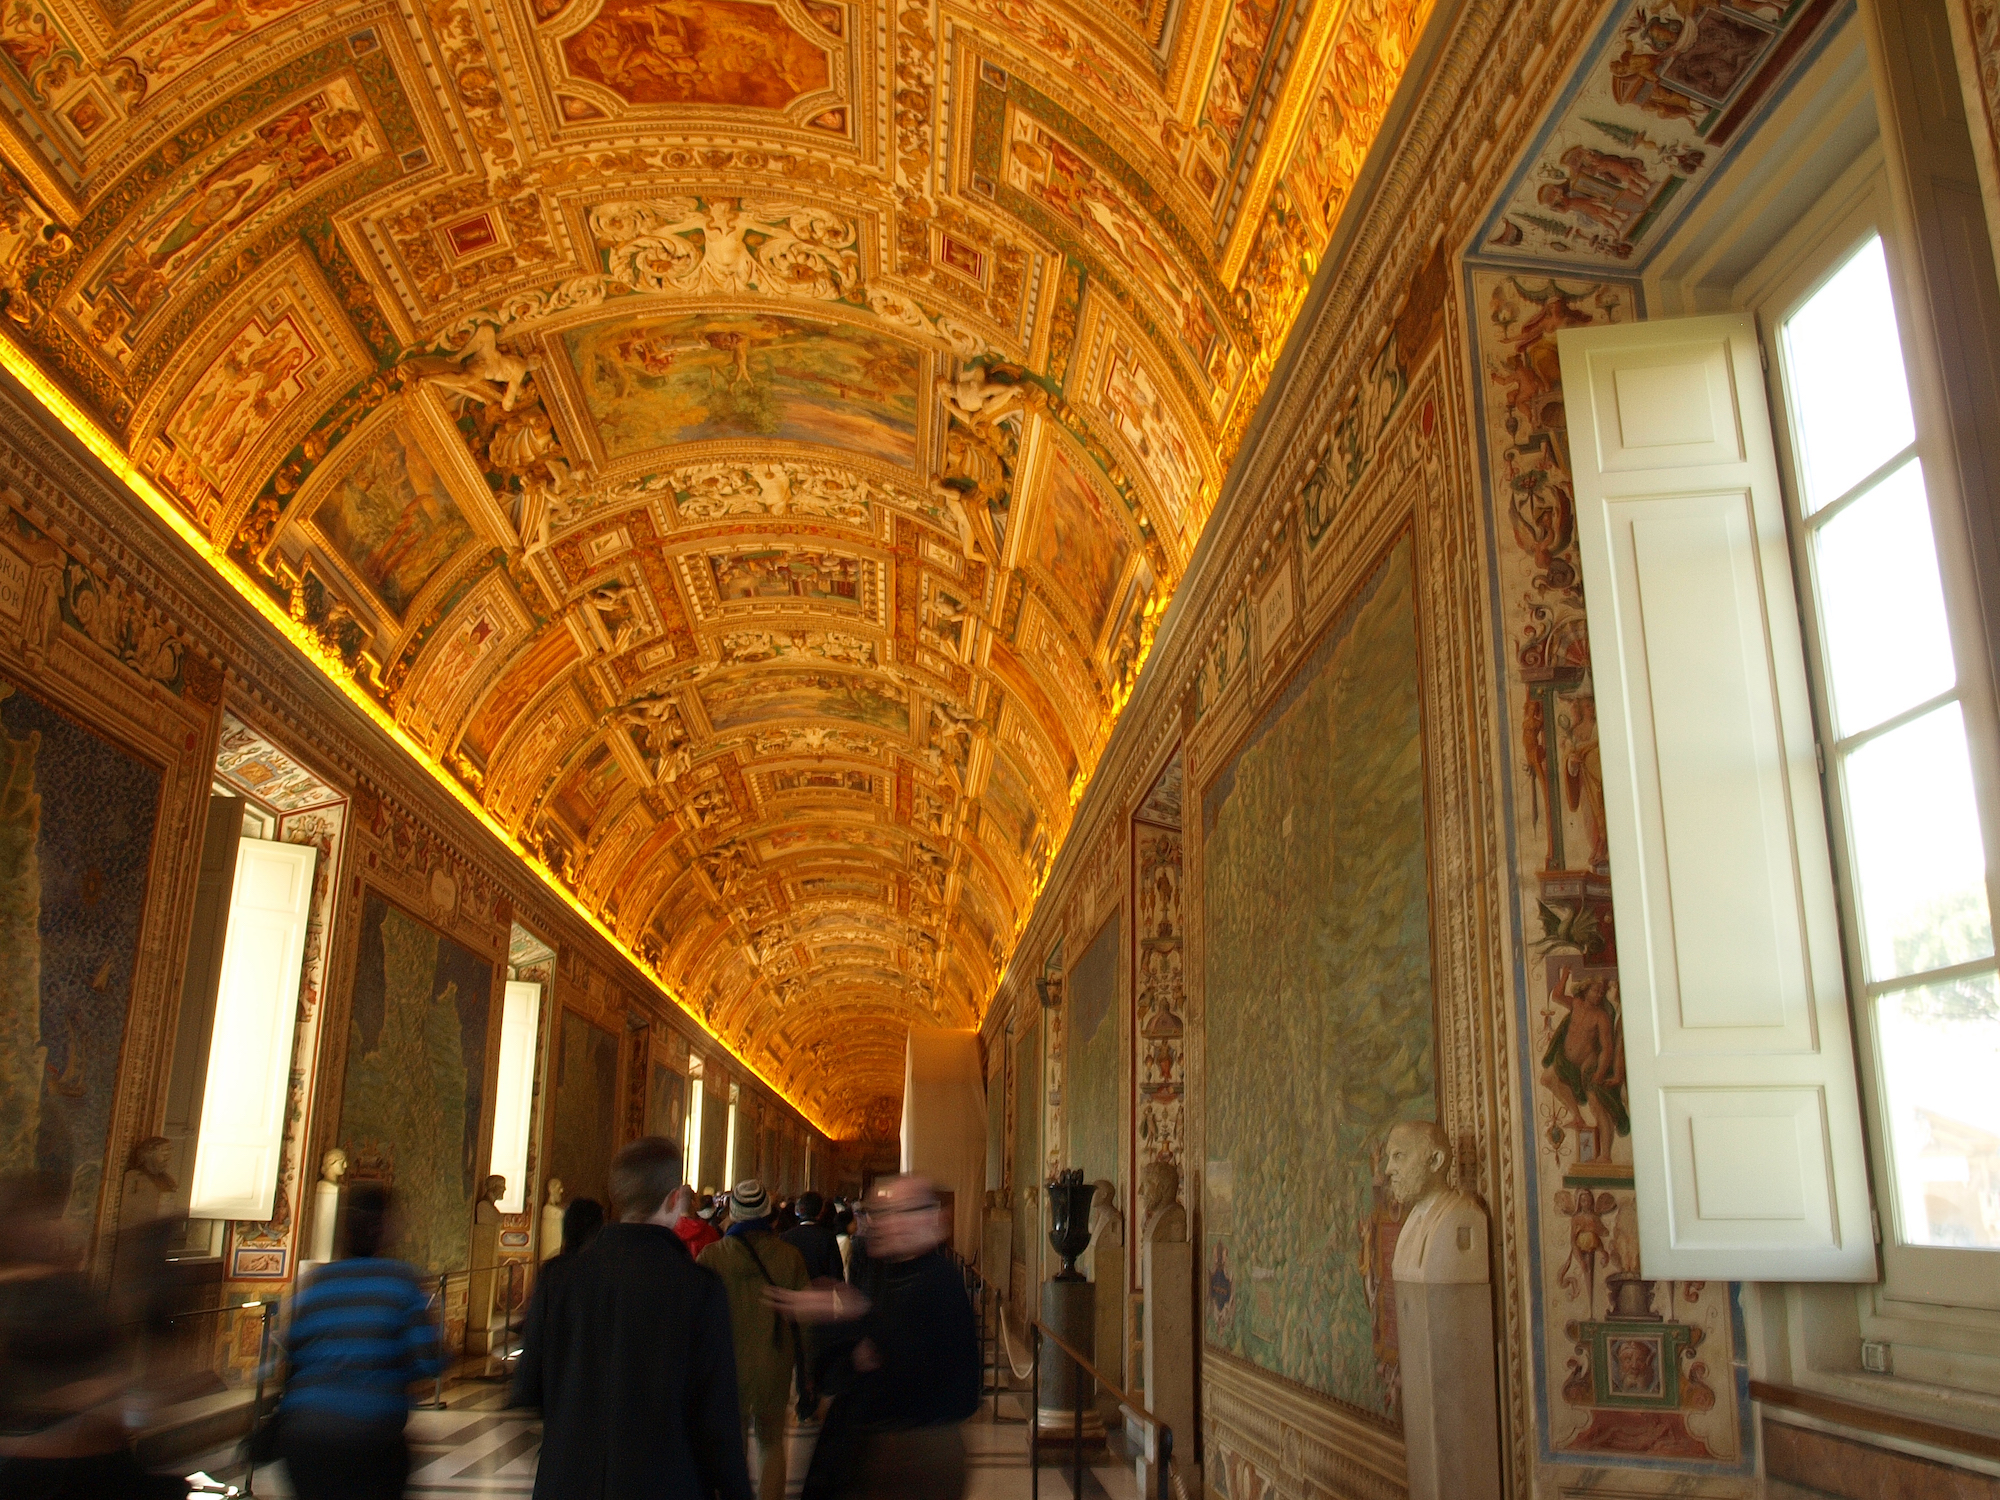 Vatican Museums, Vatican City, Italy  / Geena Matuson @geenamatuson #thegirlmirage